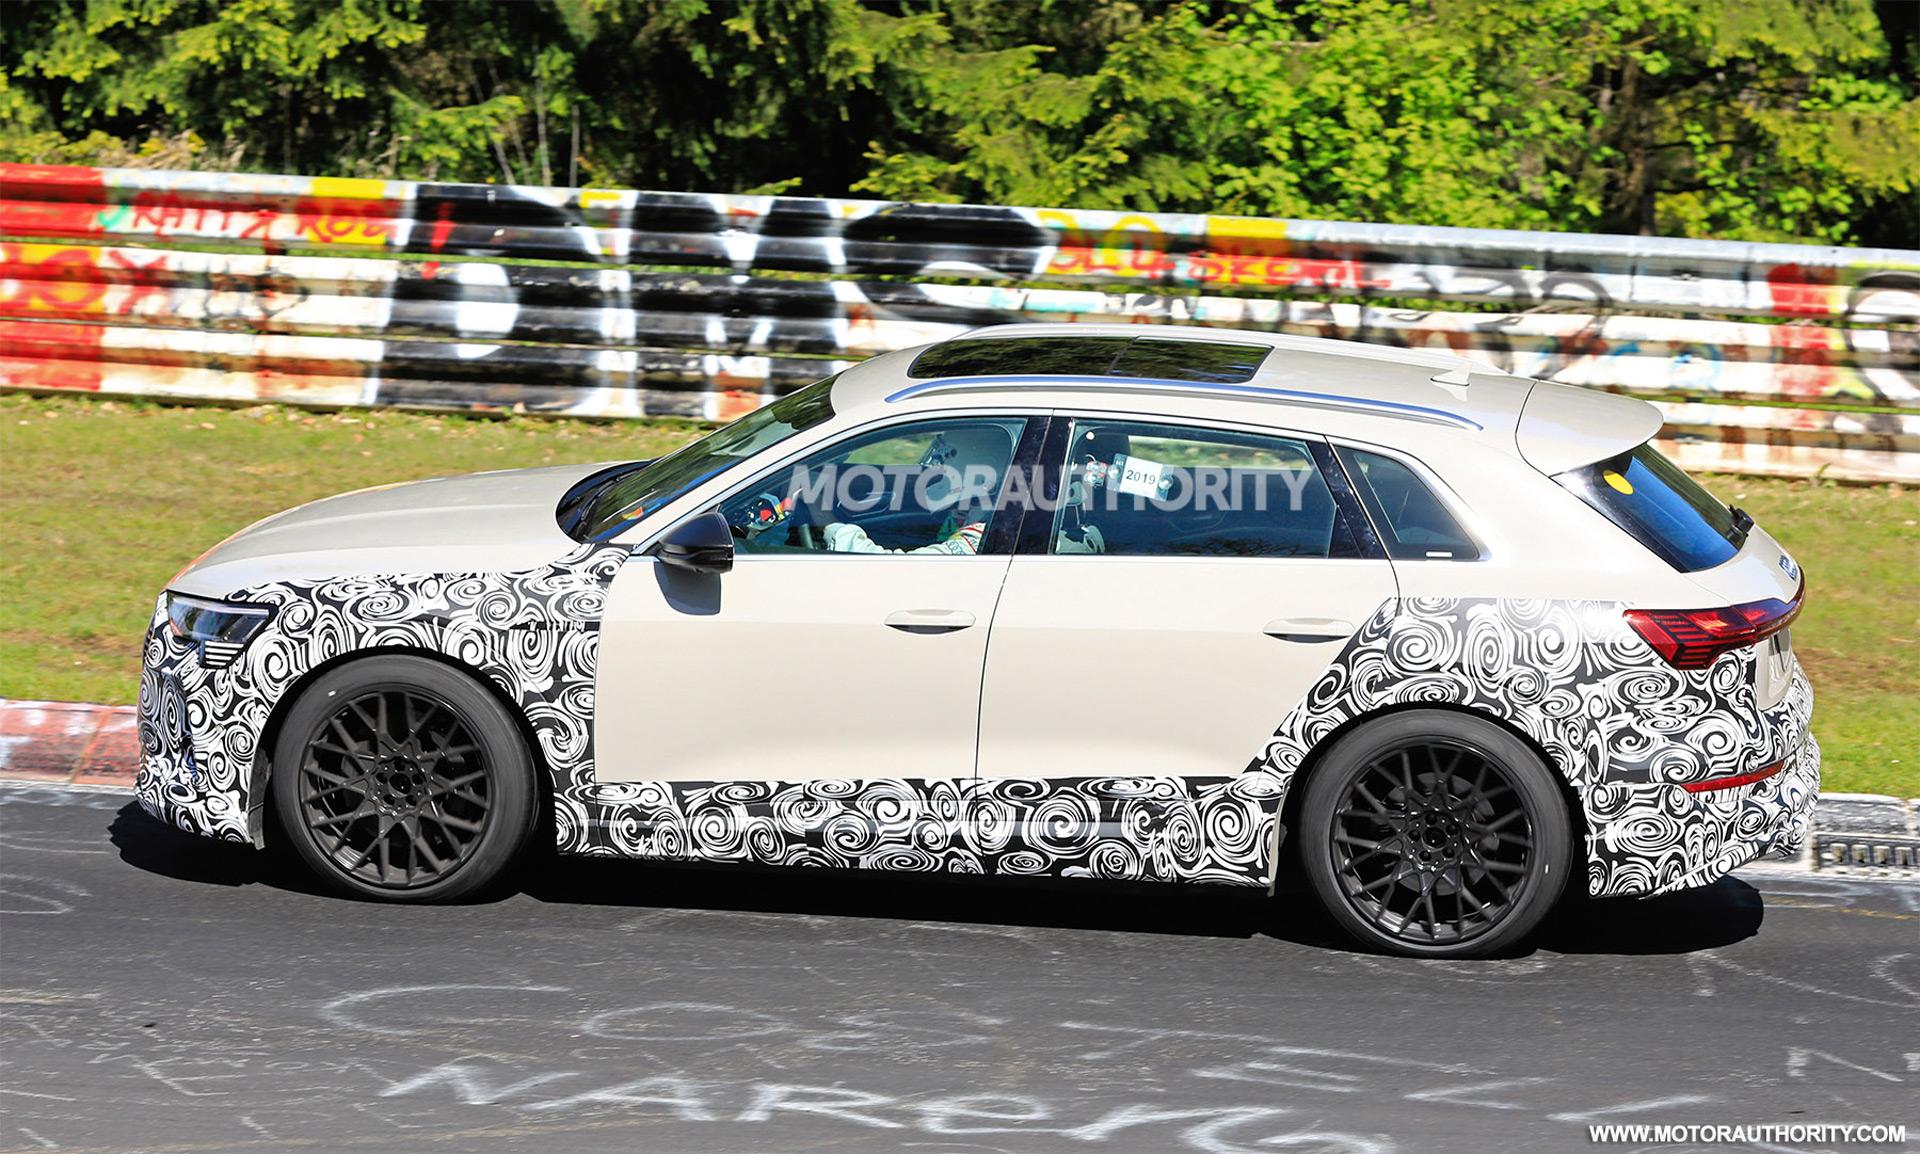 2018 [Audi] E-Tron Quattro - Page 7 2020-audi-e-tron-s-spy-shots--image-via-s-baldauf-sb-medien_100702343_h